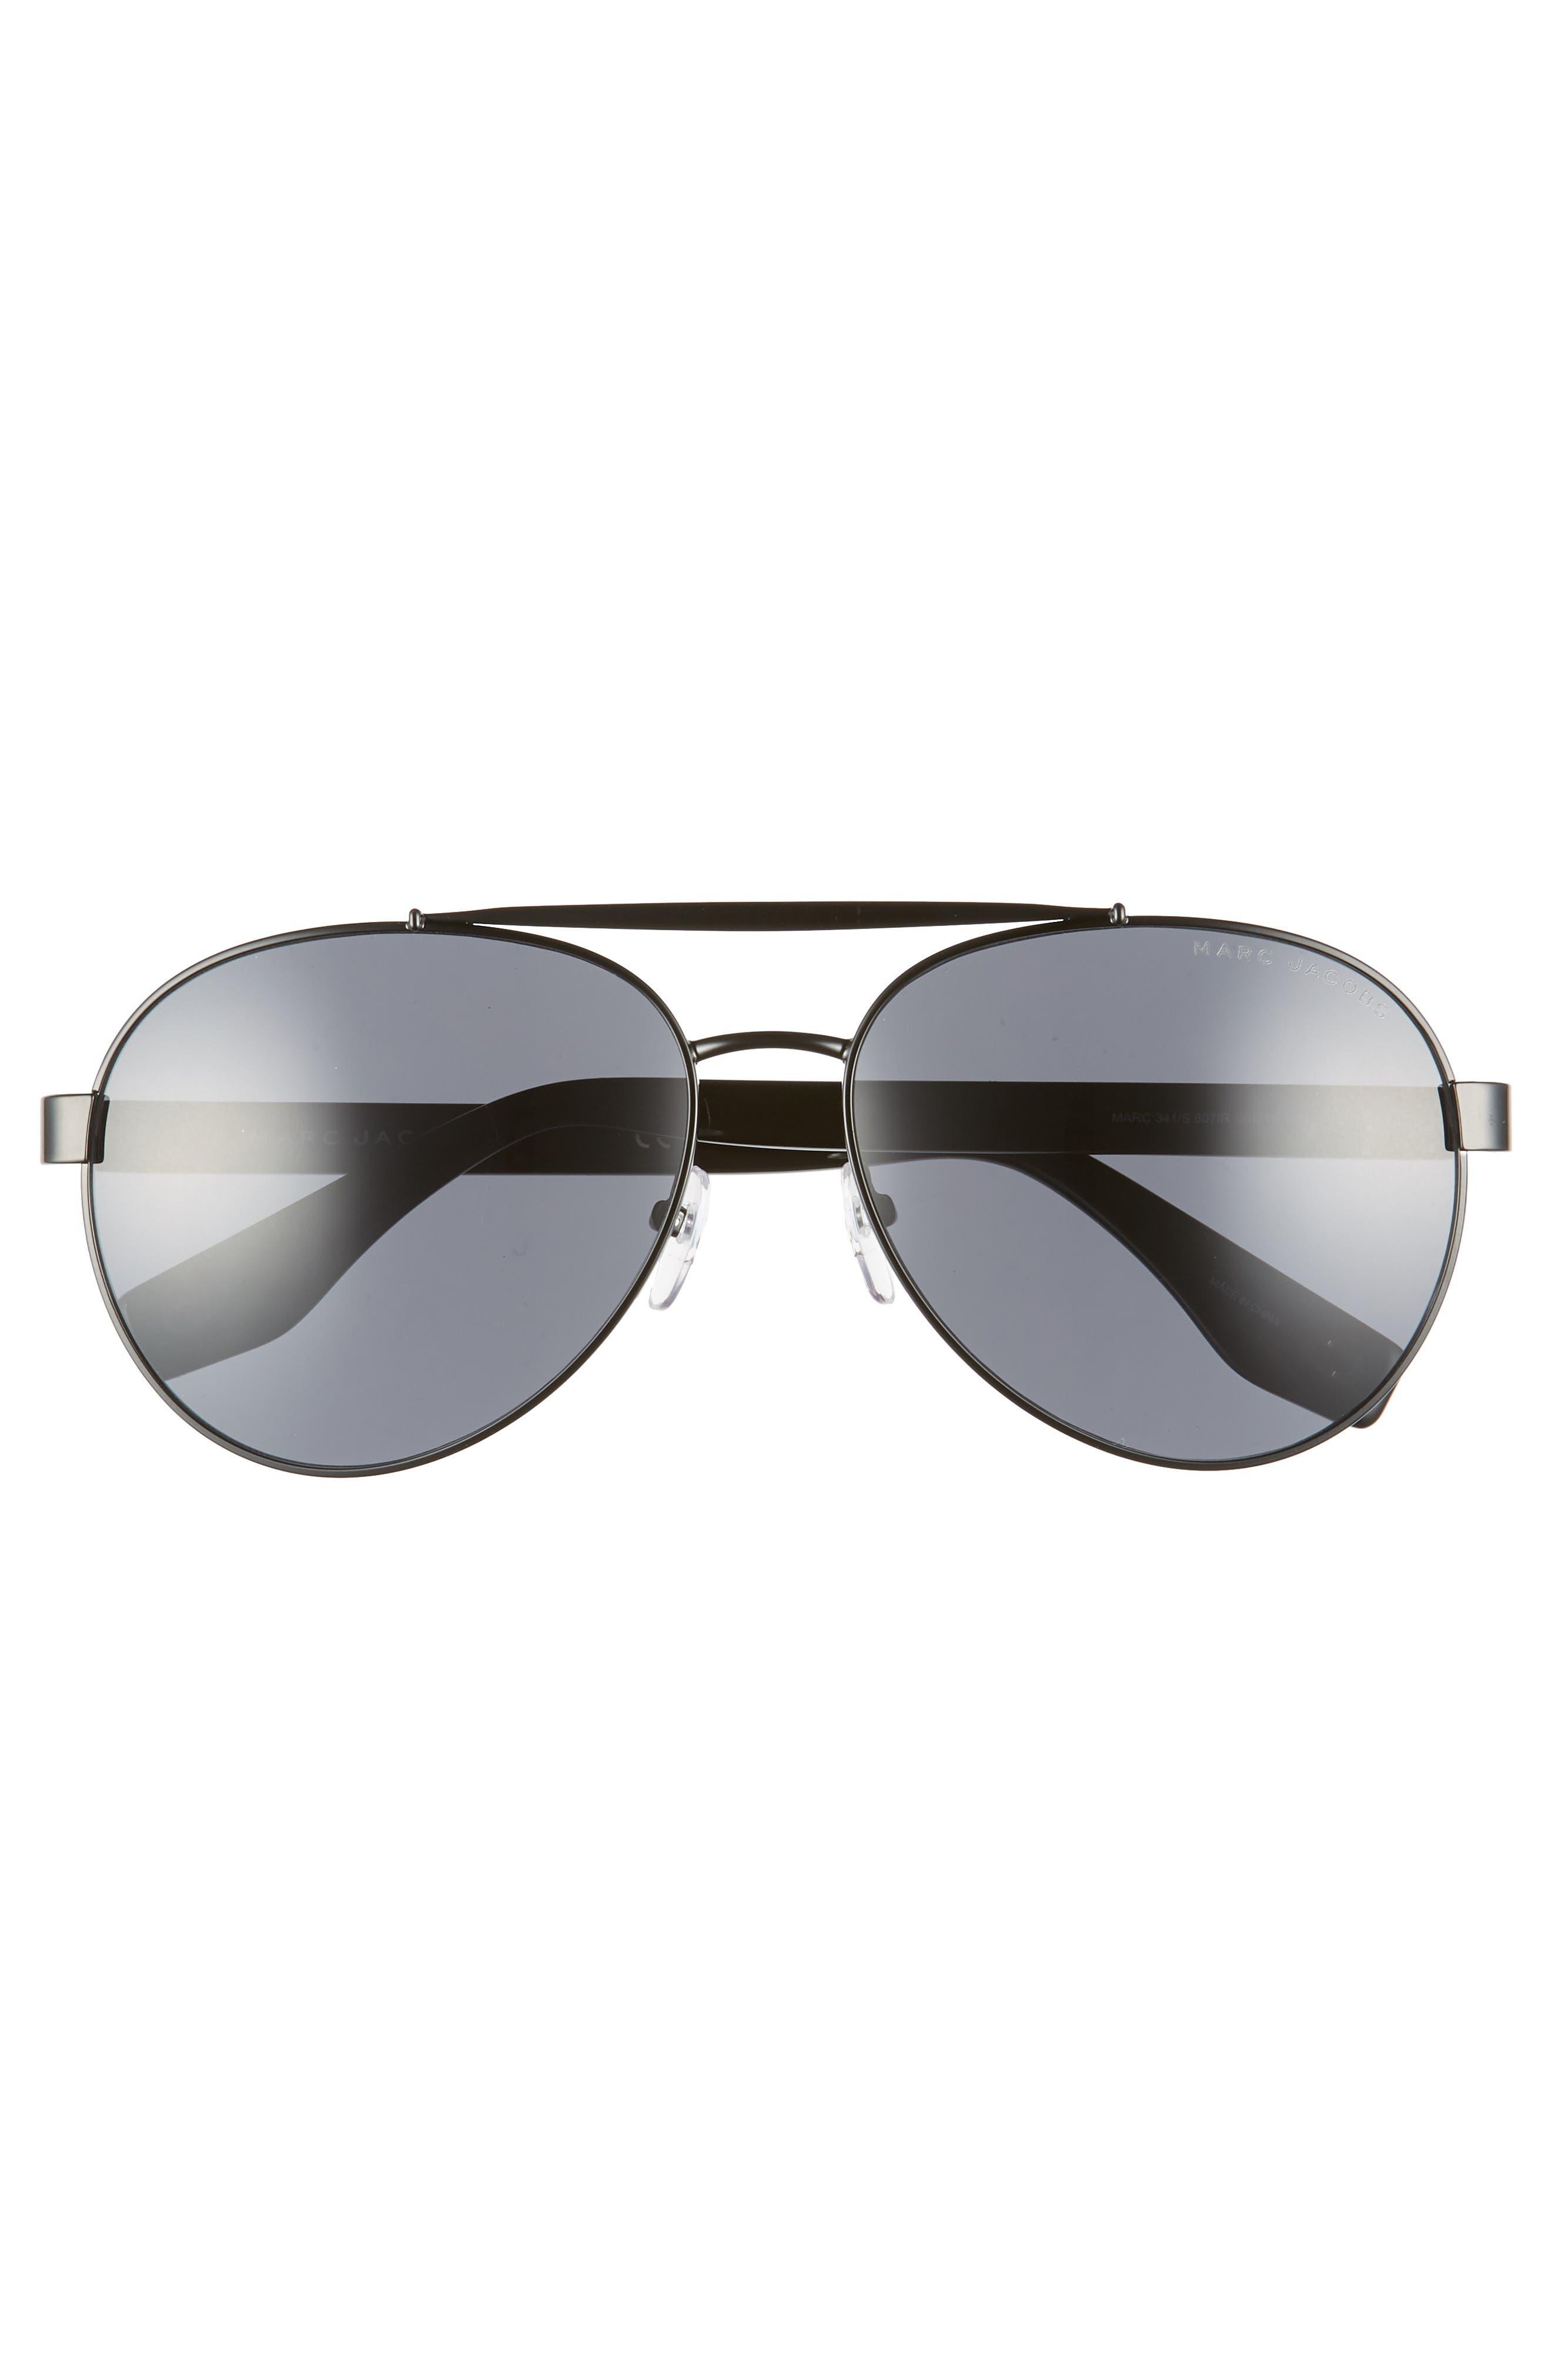 60mm Aviator Sunglasses,                             Alternate thumbnail 3, color,                             BLACK